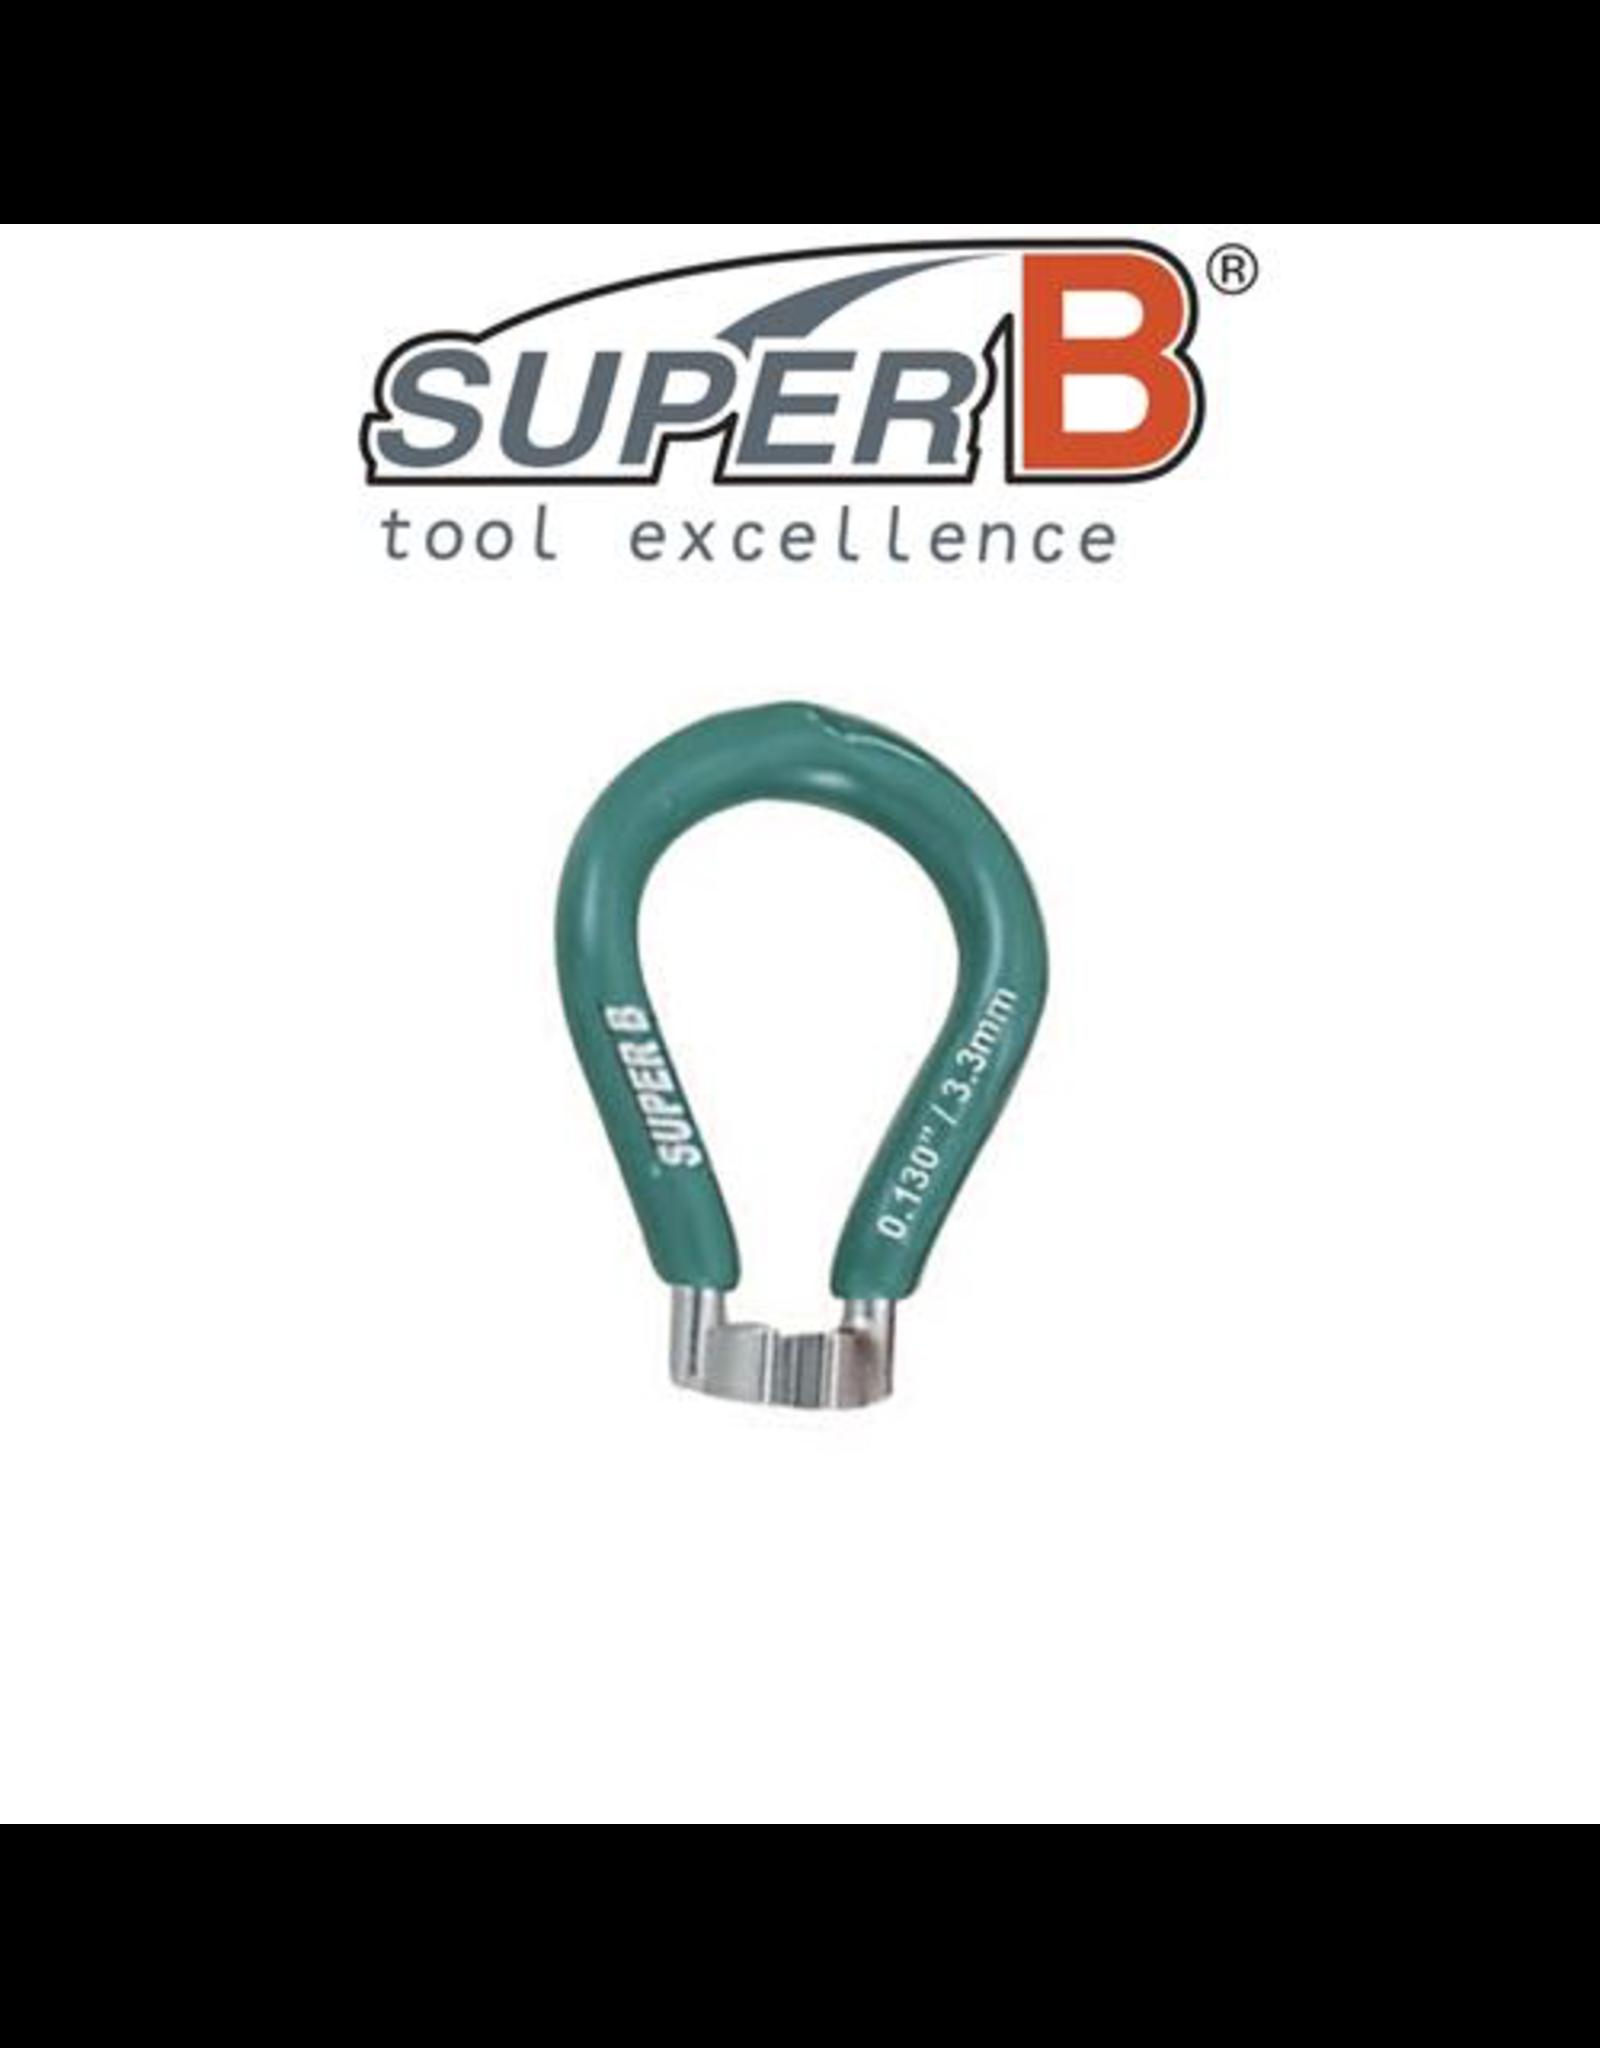 SUPER-B SUPER-B CLASSIC SPOKE WRENCH 3.3MM TOOL